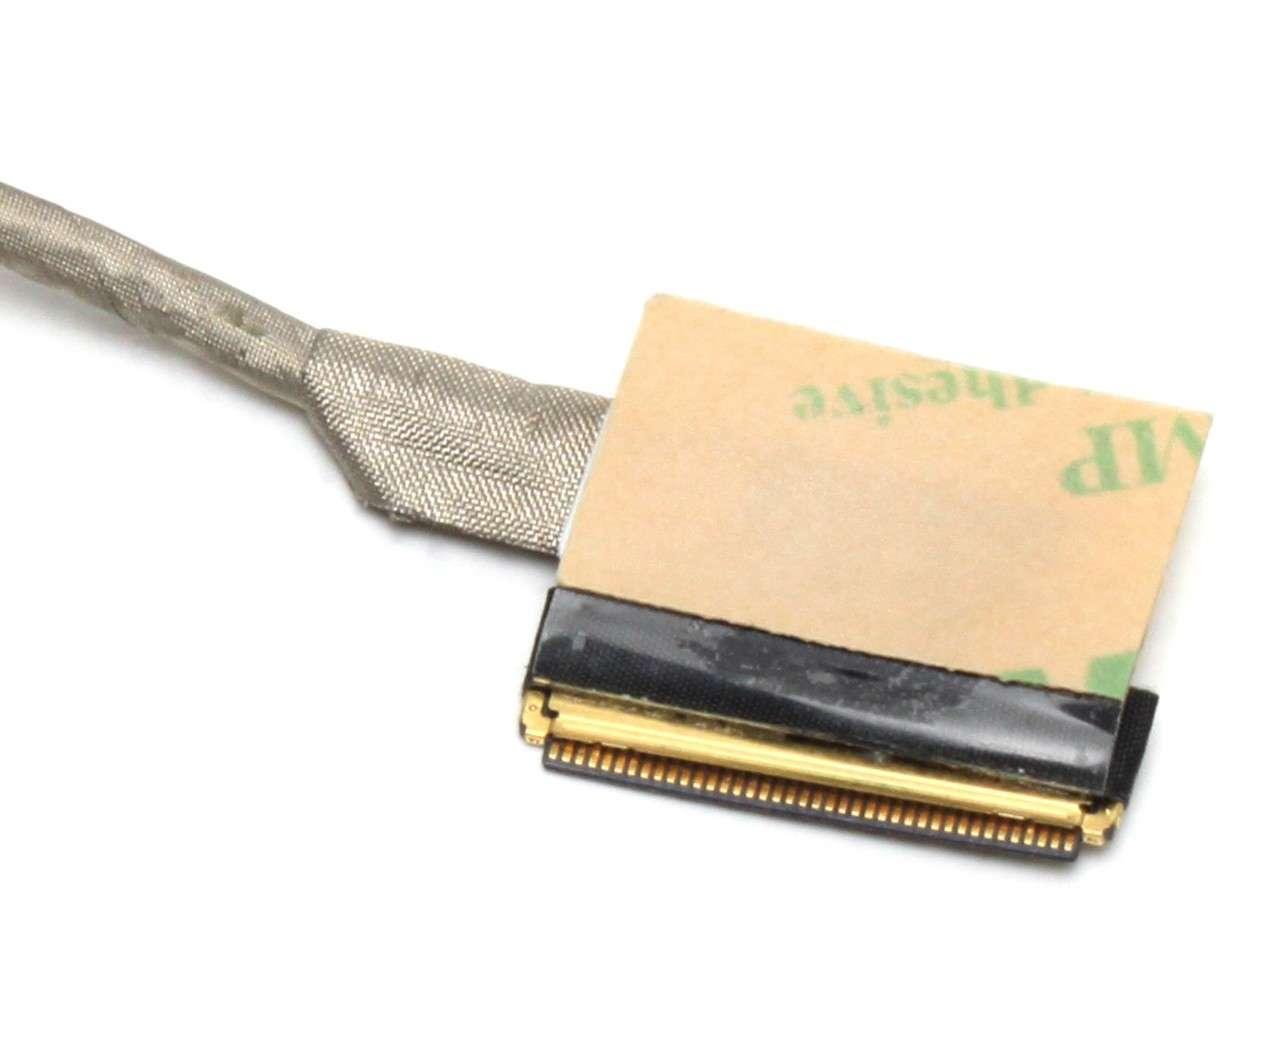 Cablu video LVDS Lenovo 0B38982 HD Plus 1600x900 imagine powerlaptop.ro 2021